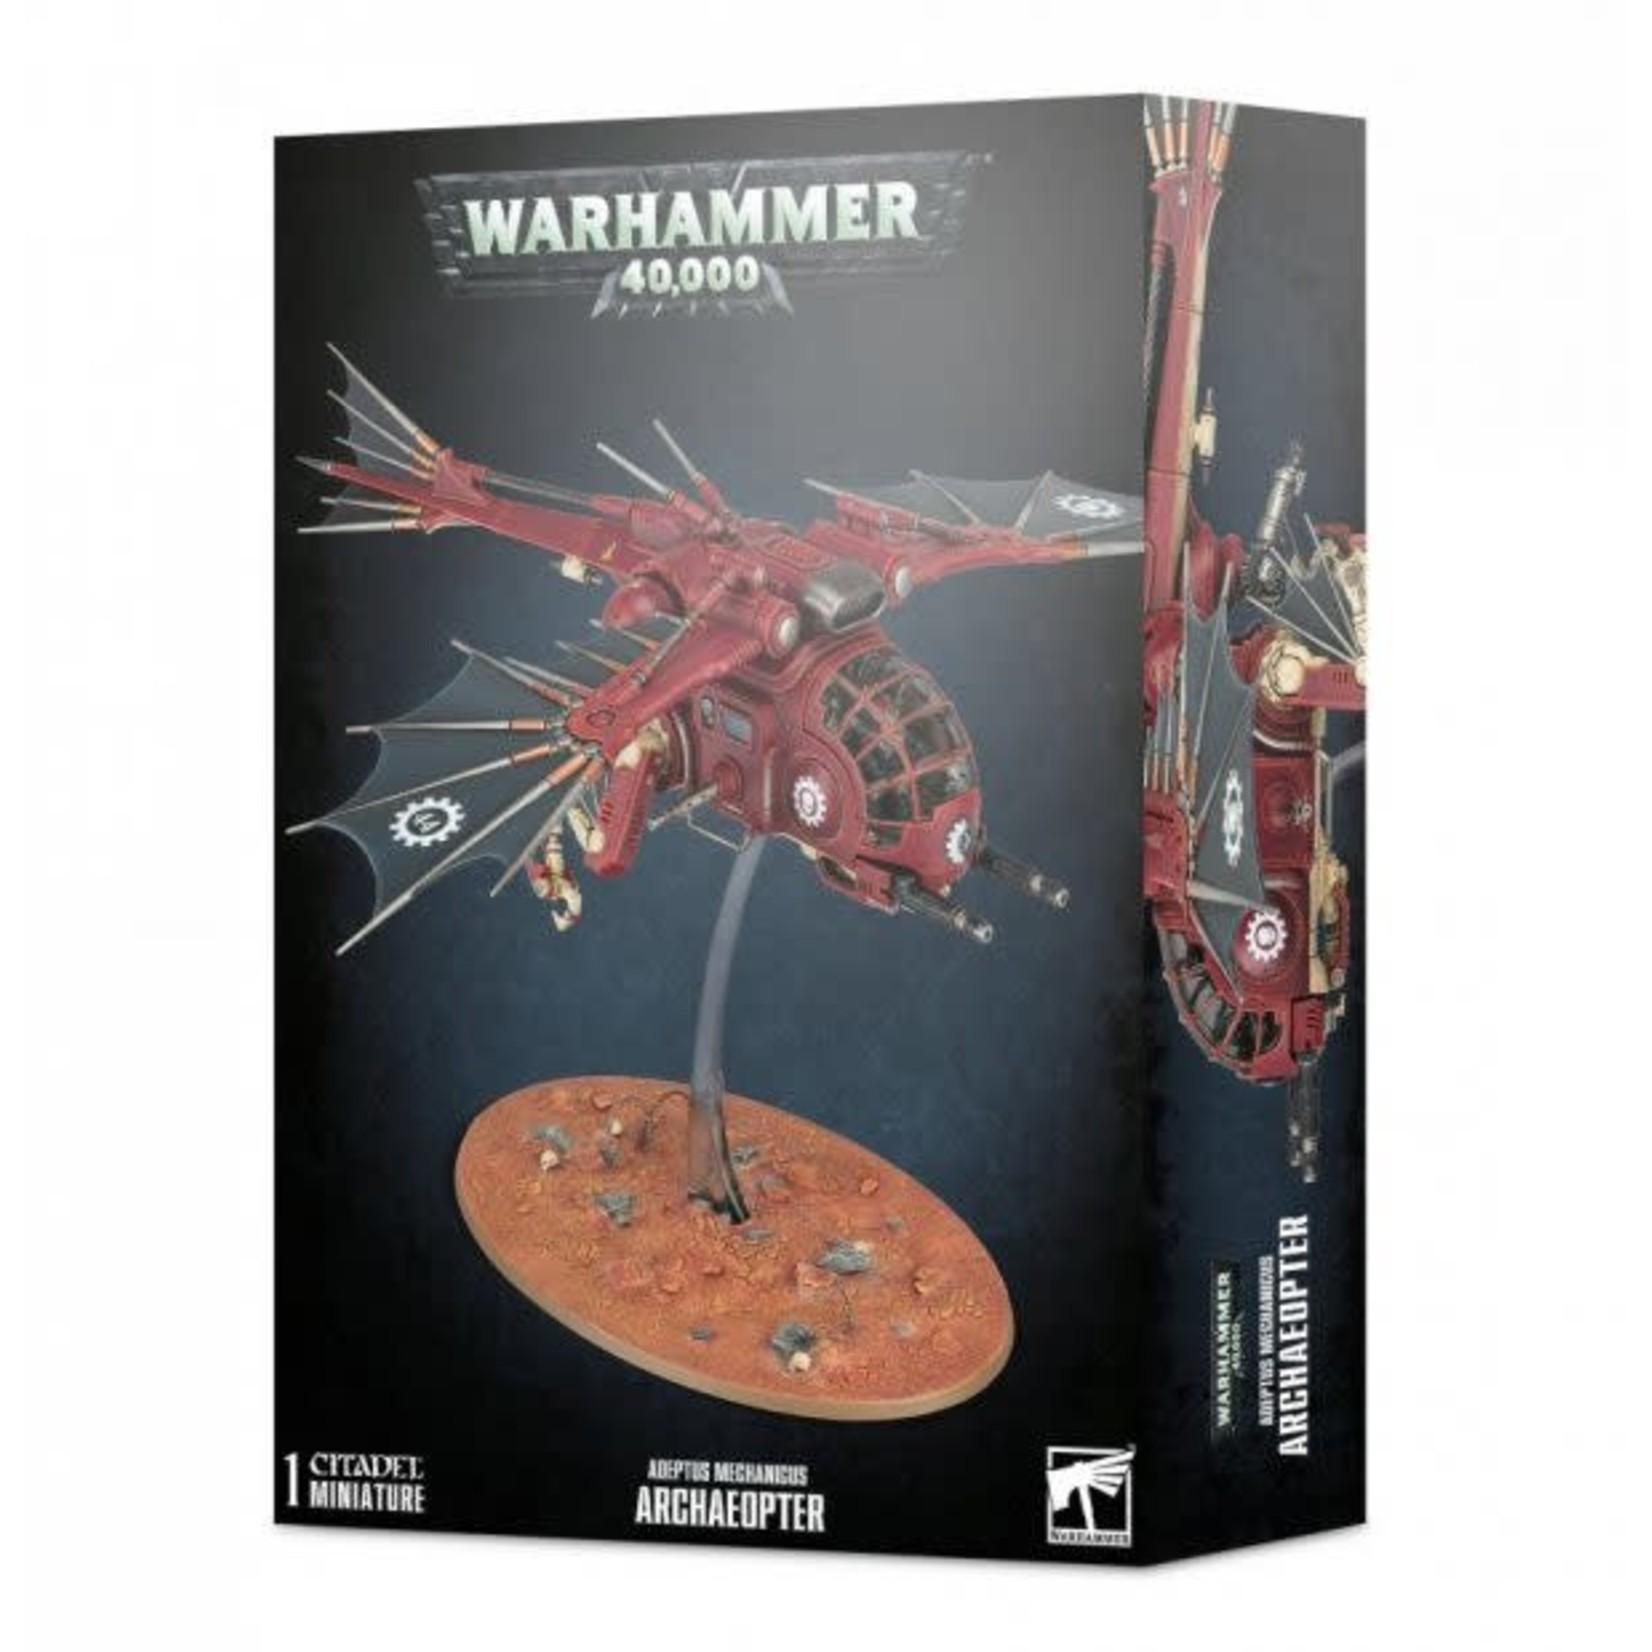 Warhammer 40K Adeptus Mechanicus - Archaeopter